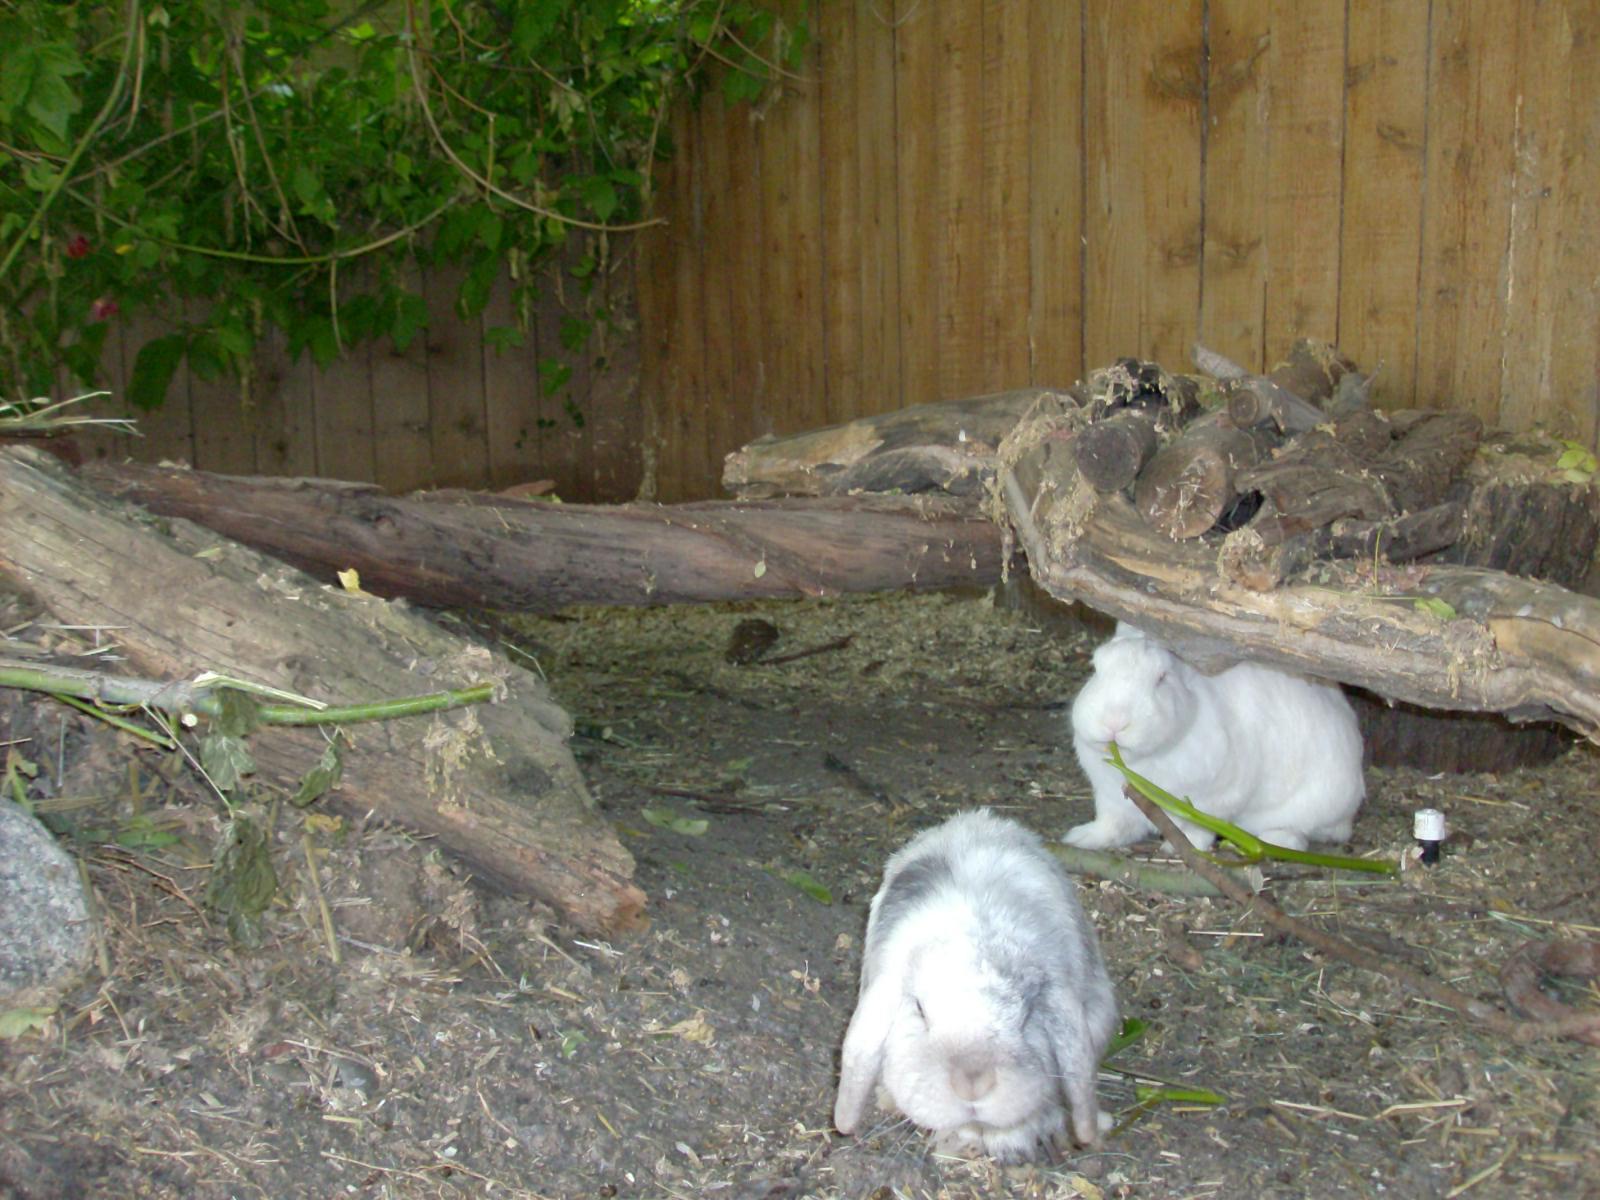 pastured rabbits experiences ideas rabbits forum at permies